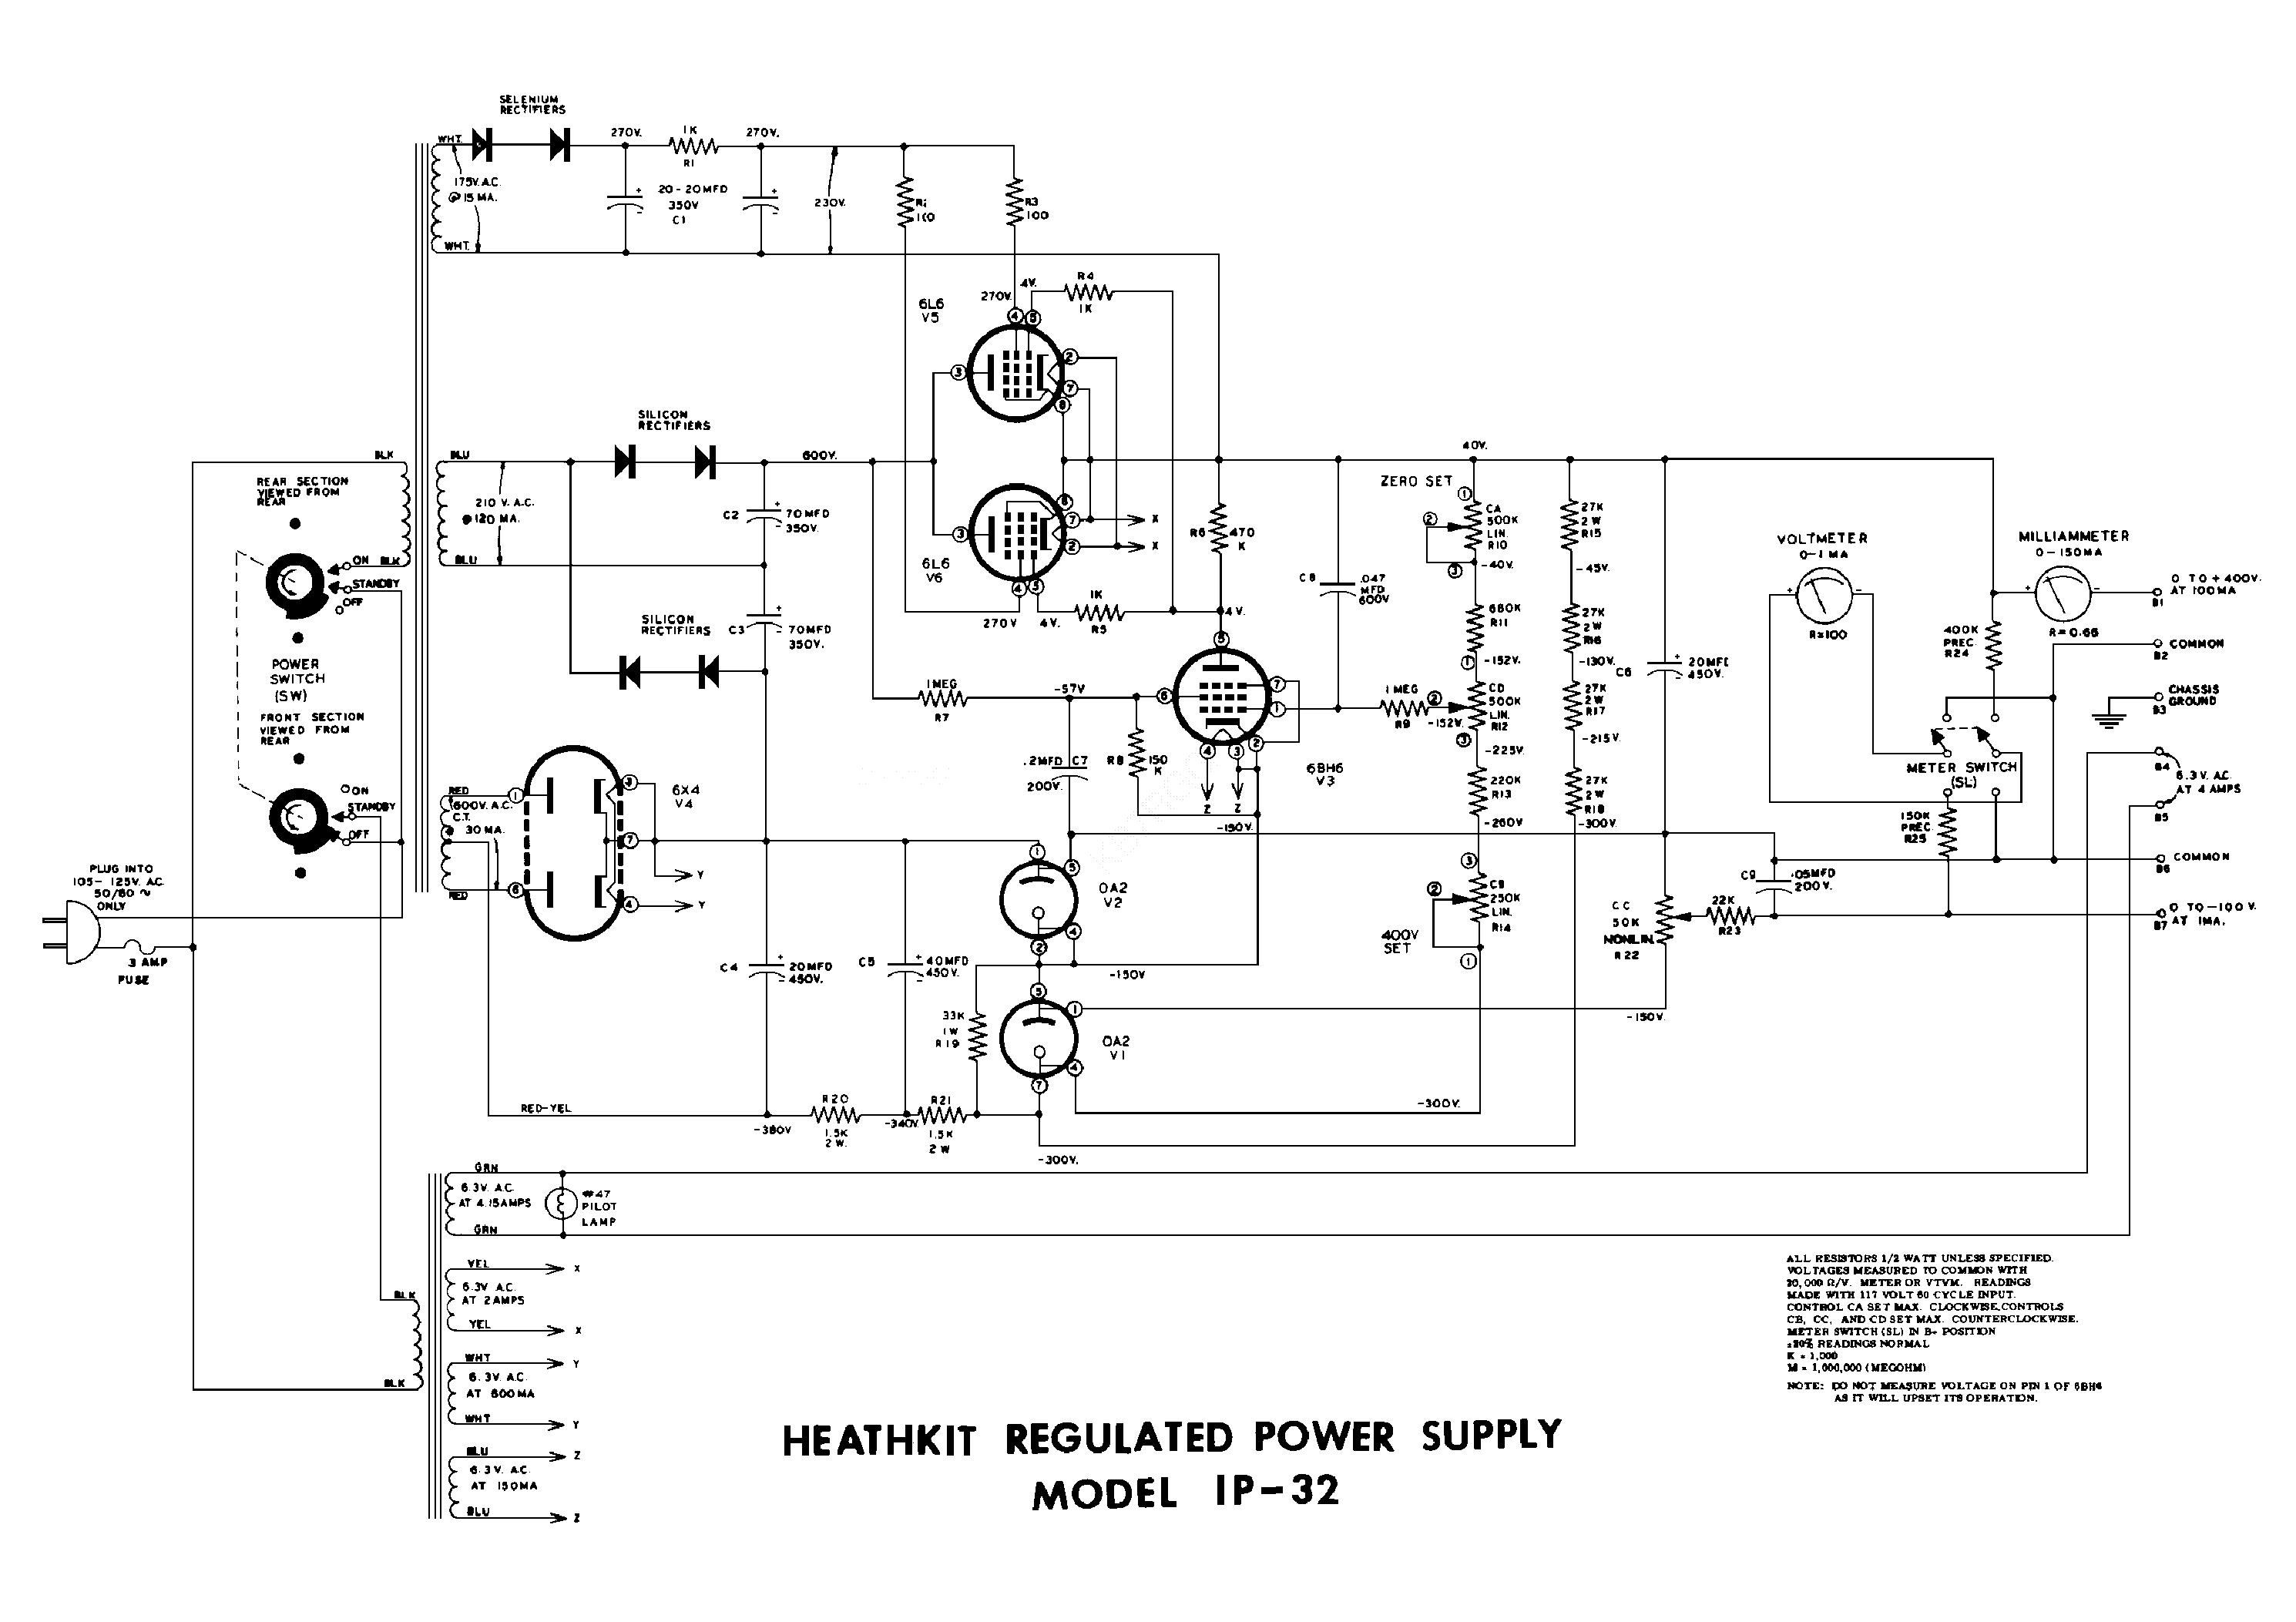 hp envy 23 service manual